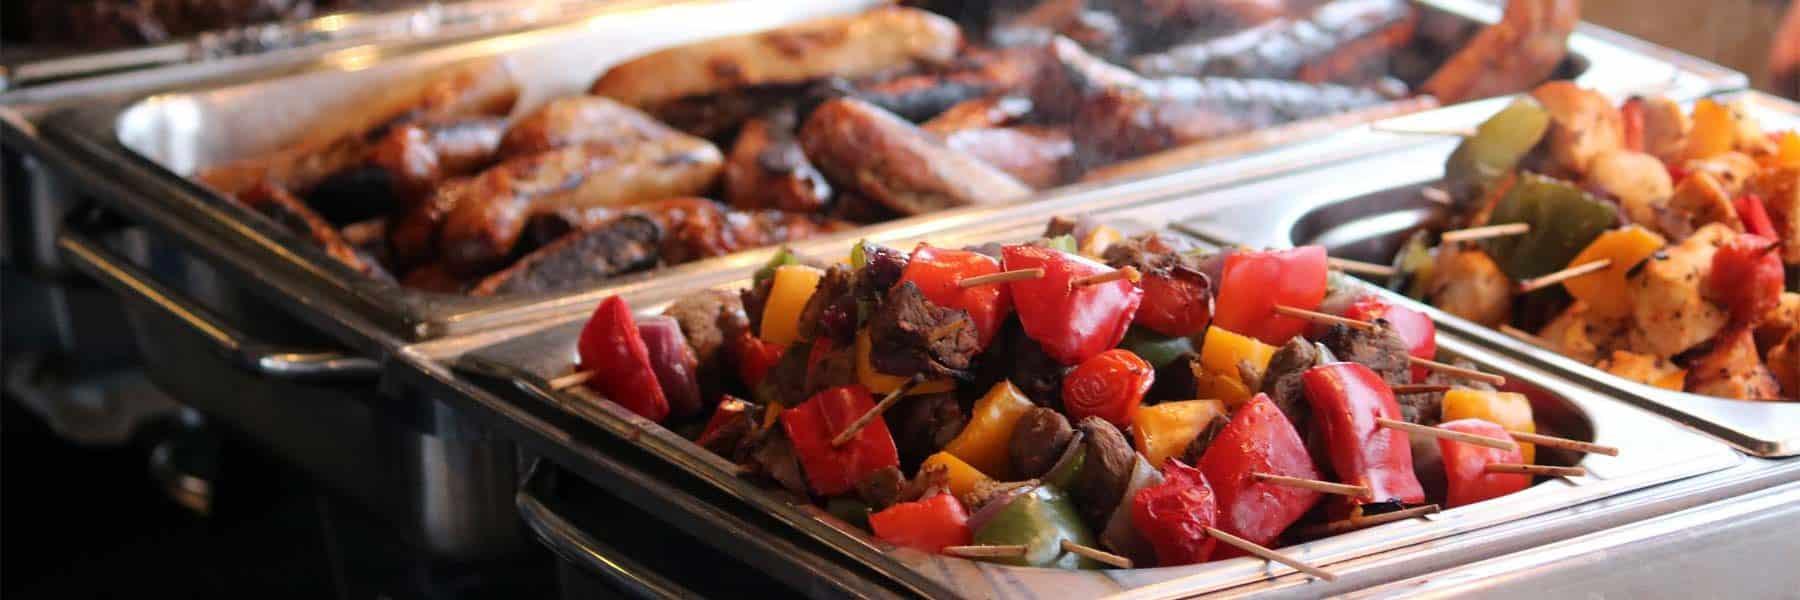 Aberdeen Angus Beef Burgers, Grilled Cumberland Sausages & Welsh Lamb Kofta Kebabs